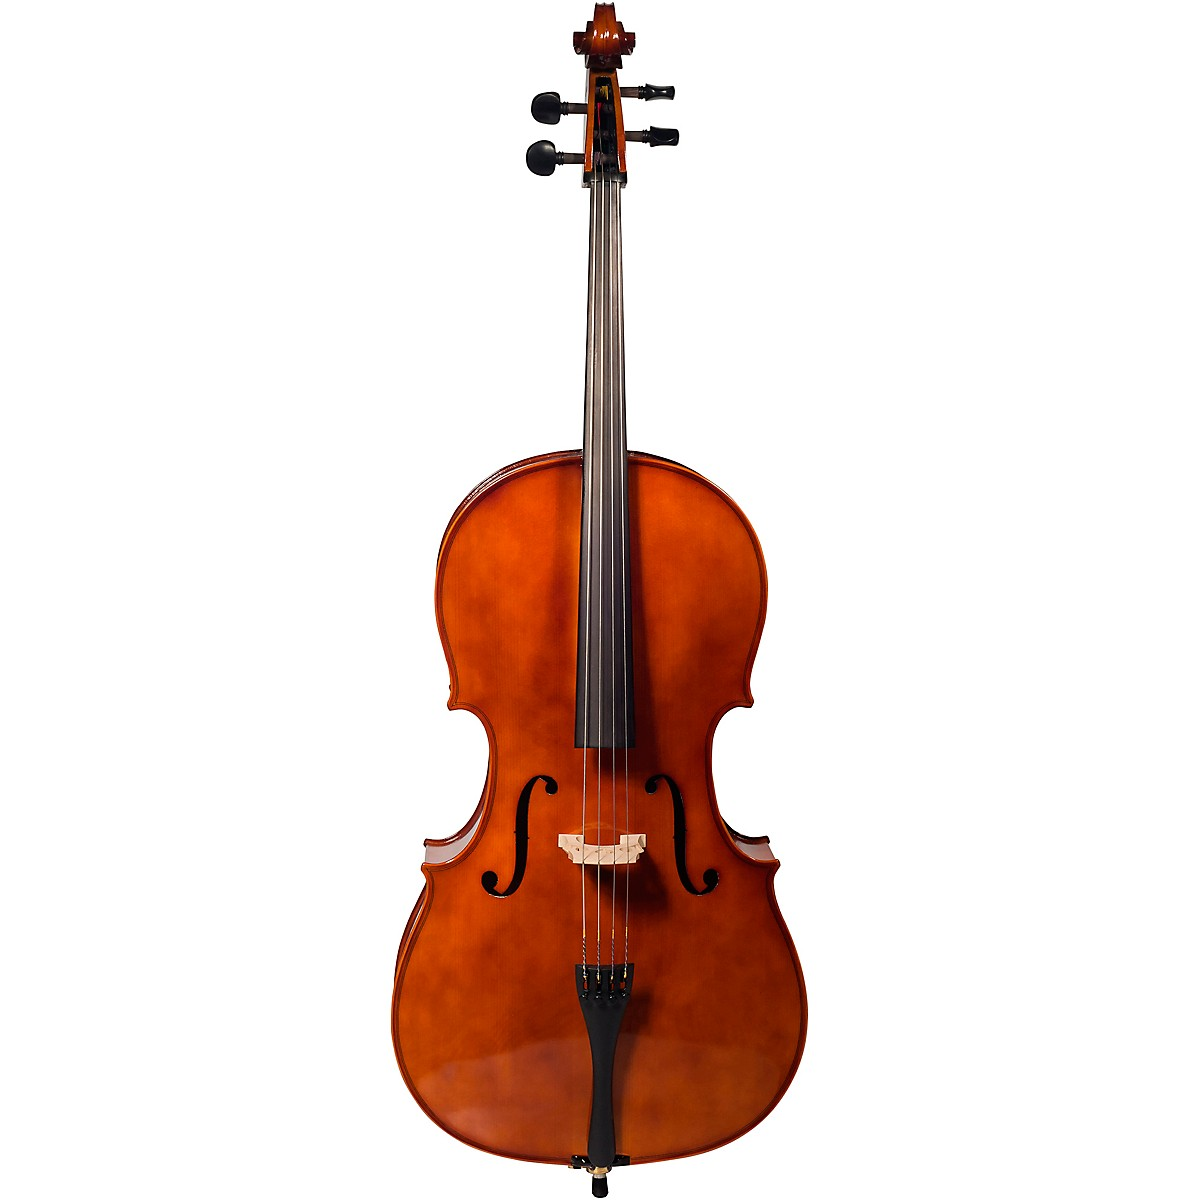 STROBEL MC-160 Student Series 1/2 Size Hybrid Cello Outfit